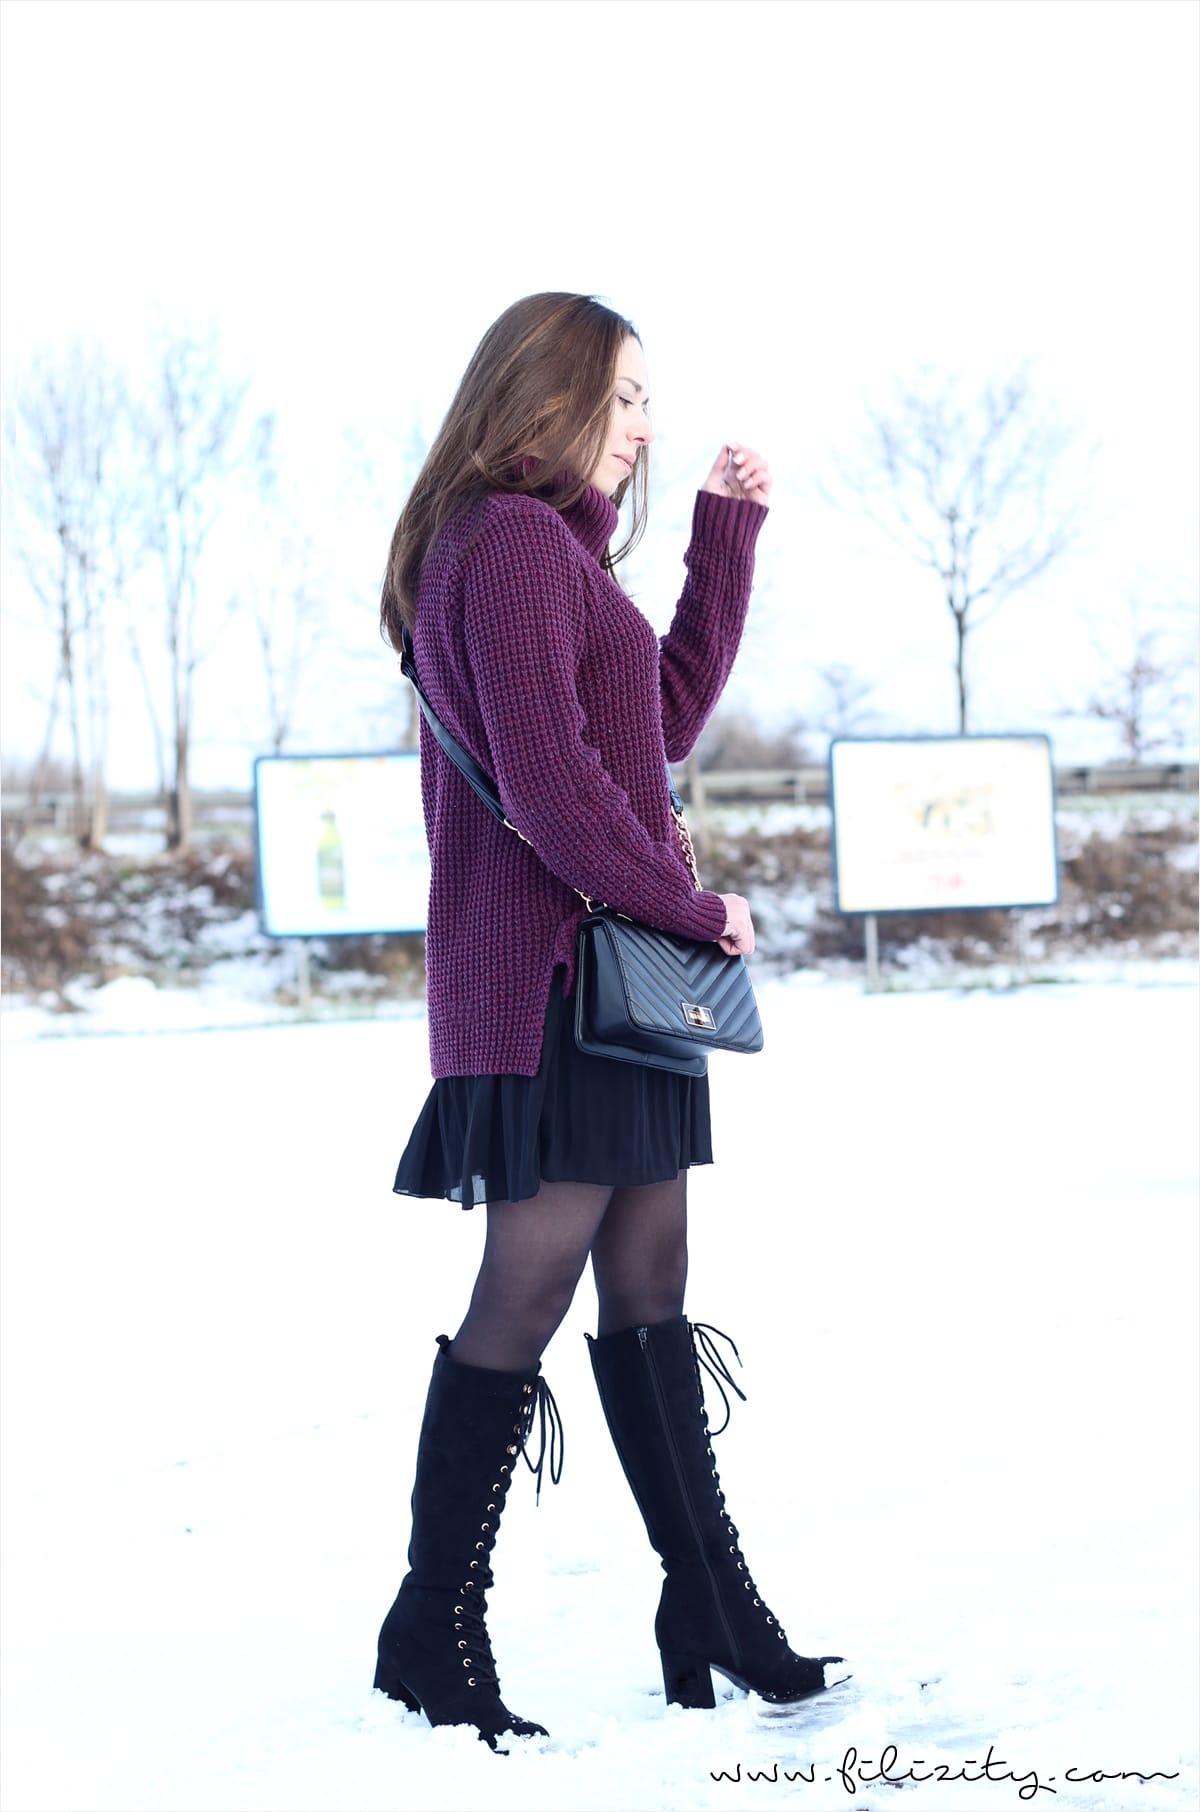 Röcke im Winter: Styling Tipps